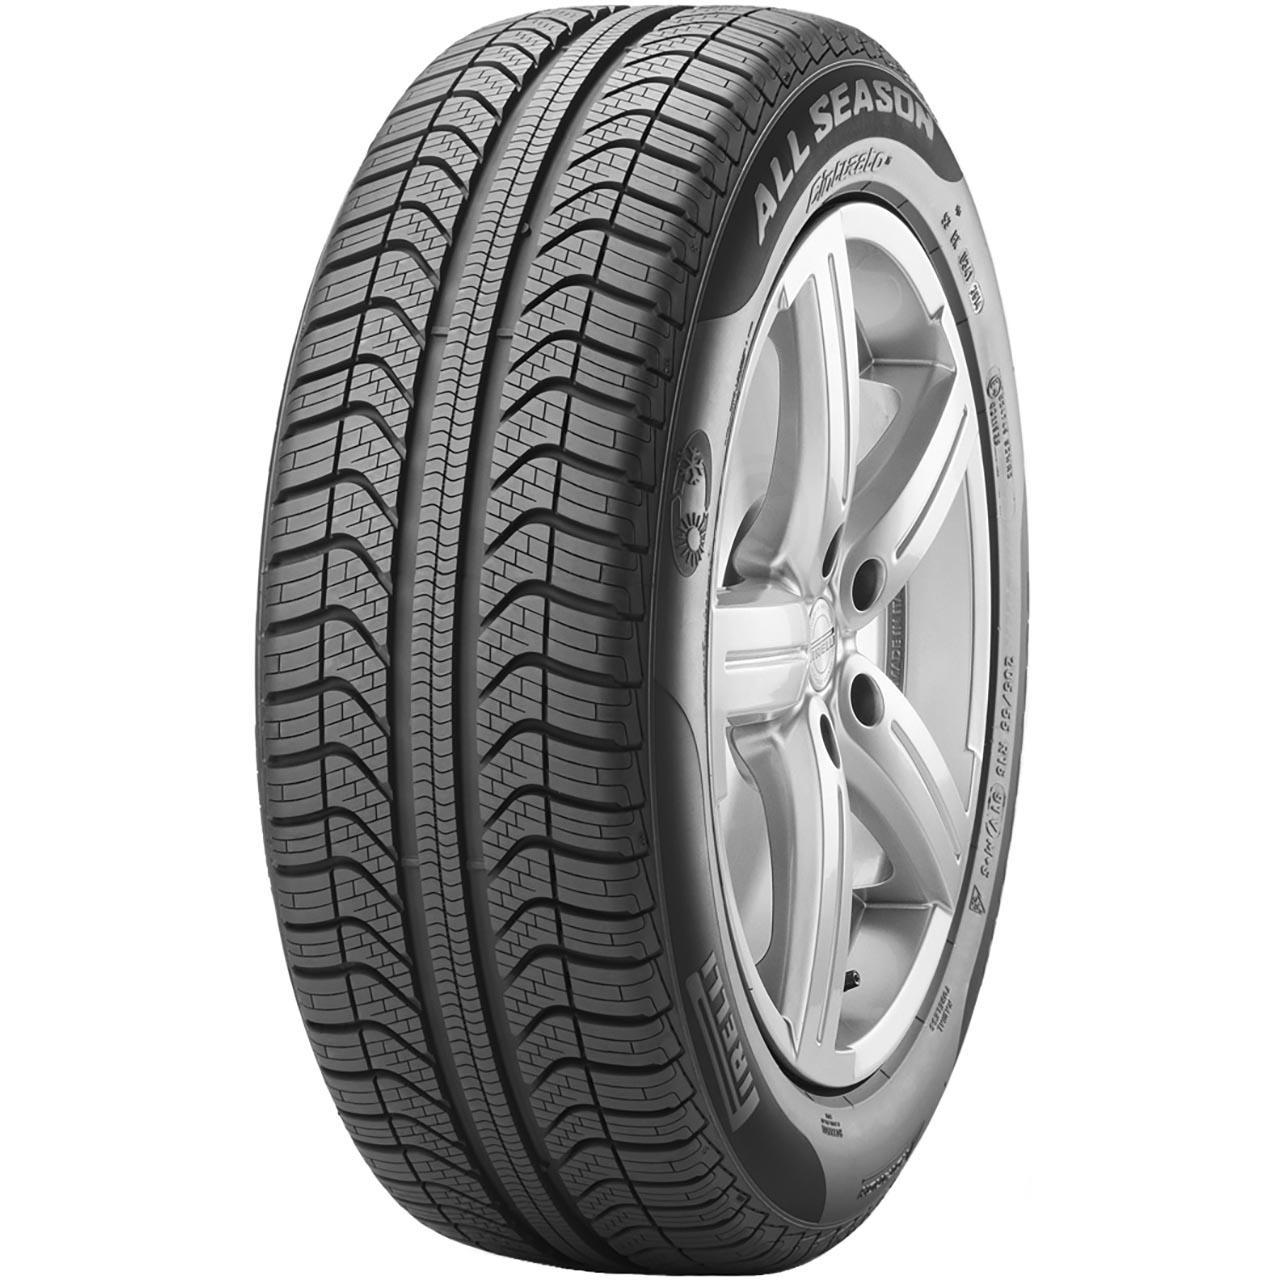 Pirelli Cinturato ALL Season Plus 195/65R15 91V